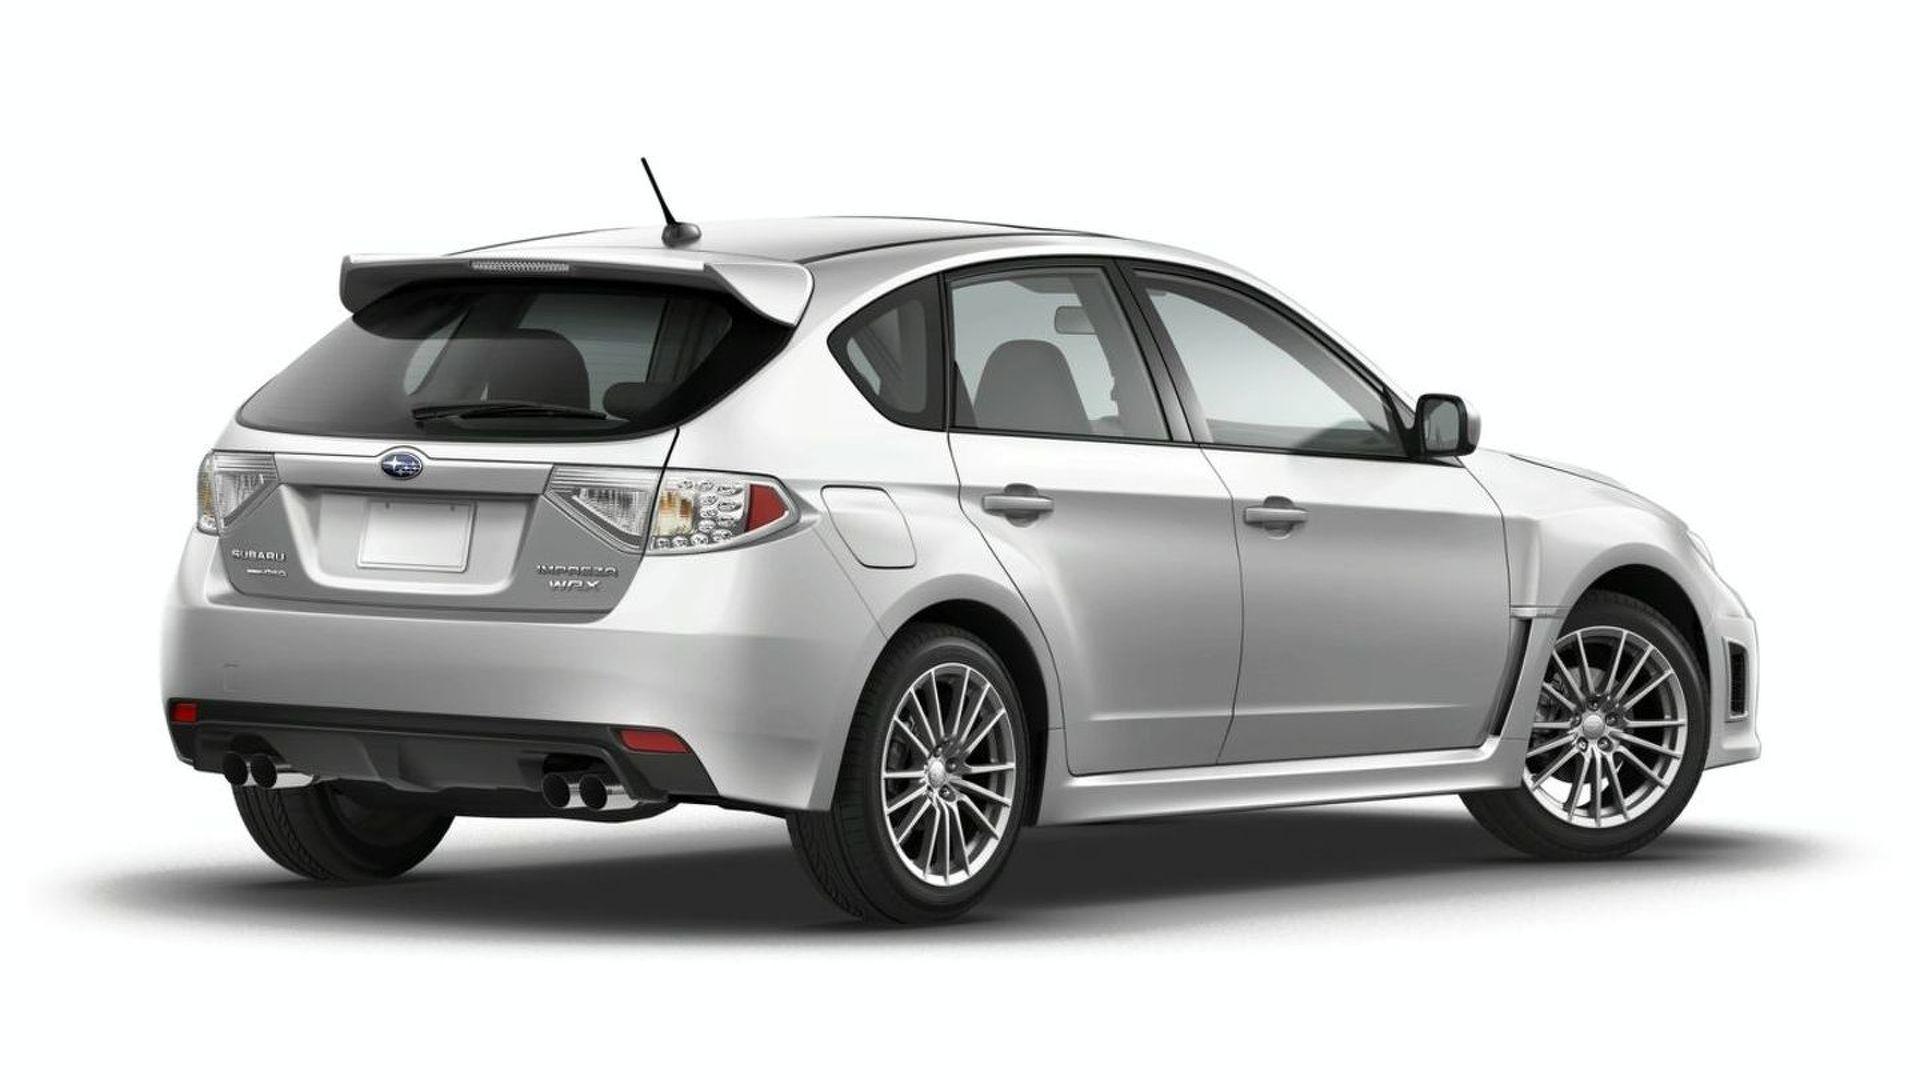 2011 Subaru Impreza Wrx Facelift Gets Widebody Debut In New York